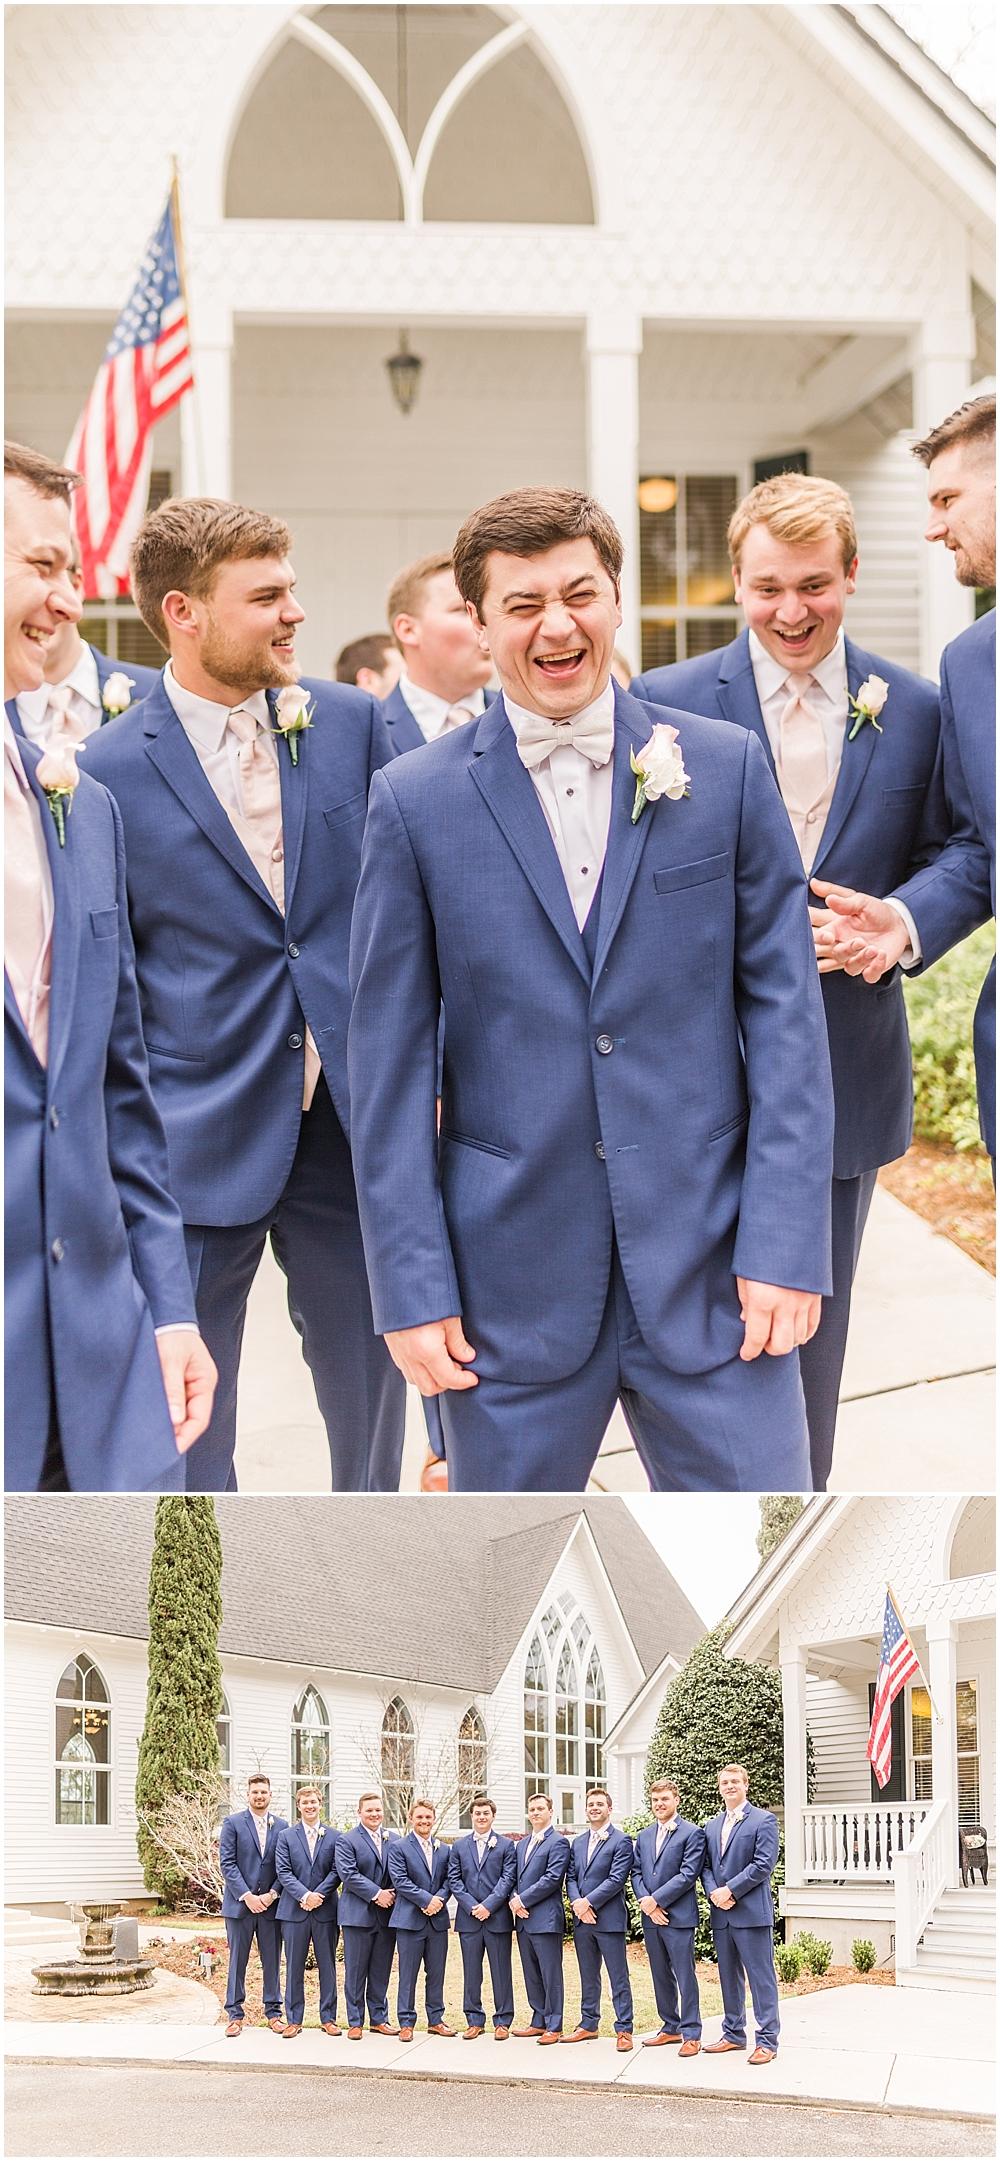 Ashton-Clark-Photography-Wedding-Portrait-Family-Photographer-Mobile-Alabama_0317.jpg